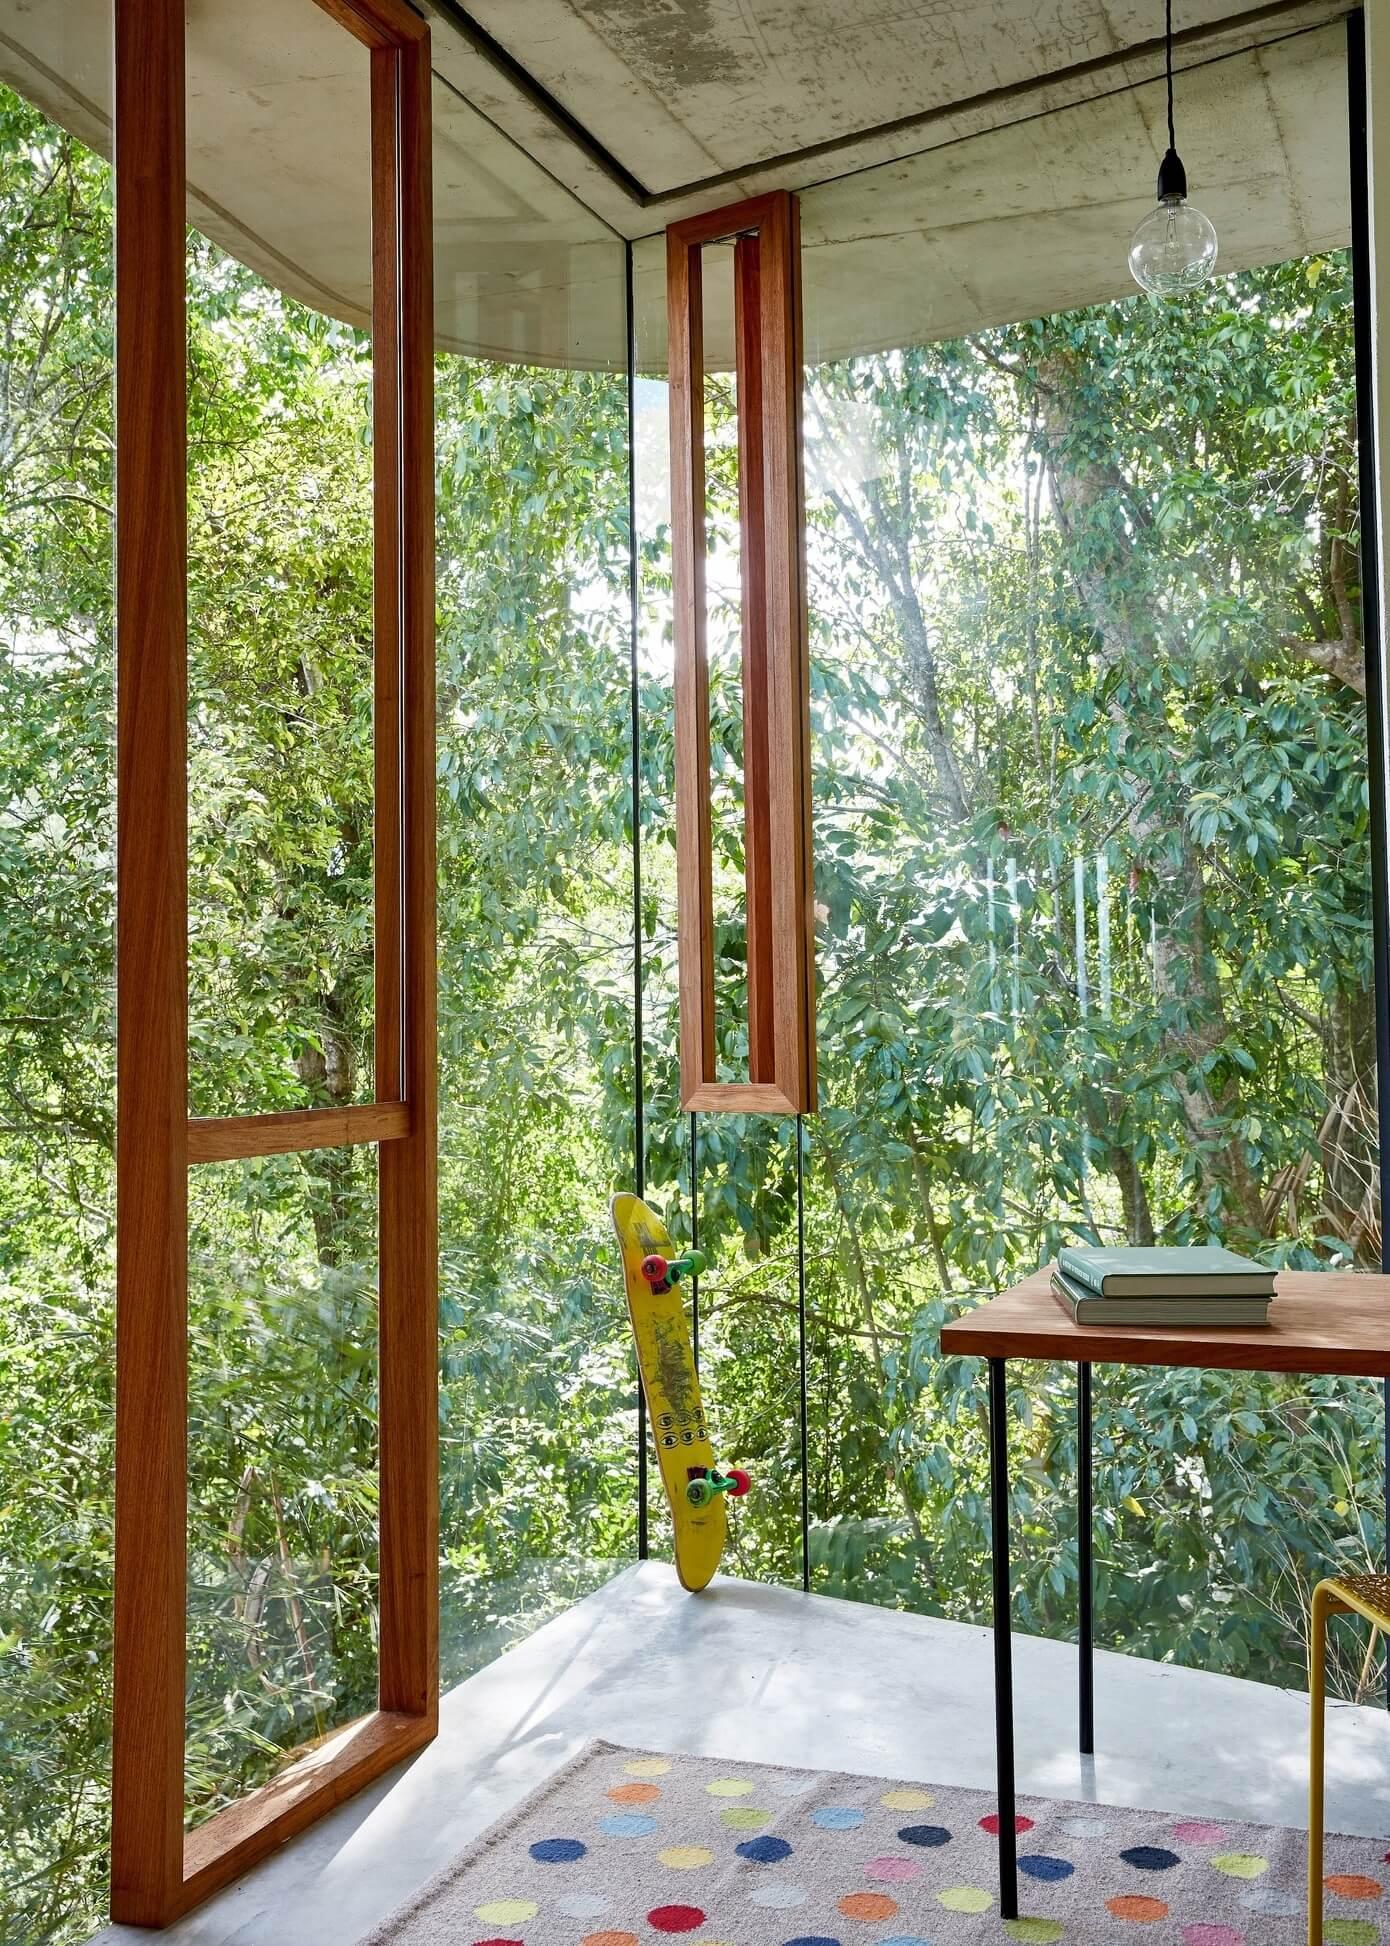 planchonella-house-jesse-bennett-architect-13